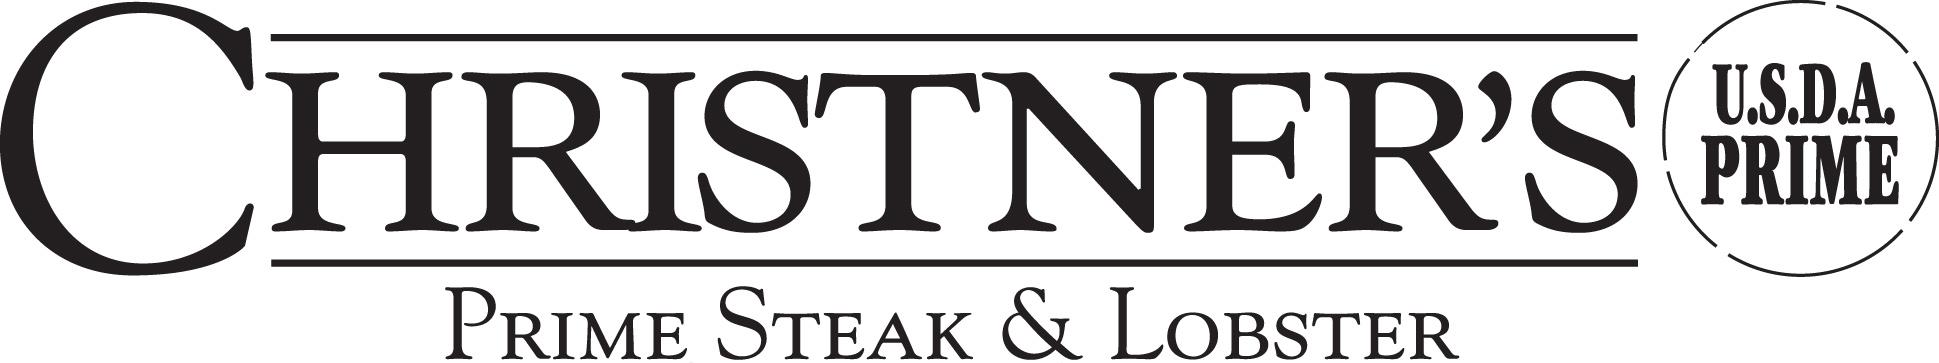 Christners Prime Steak & Lobster